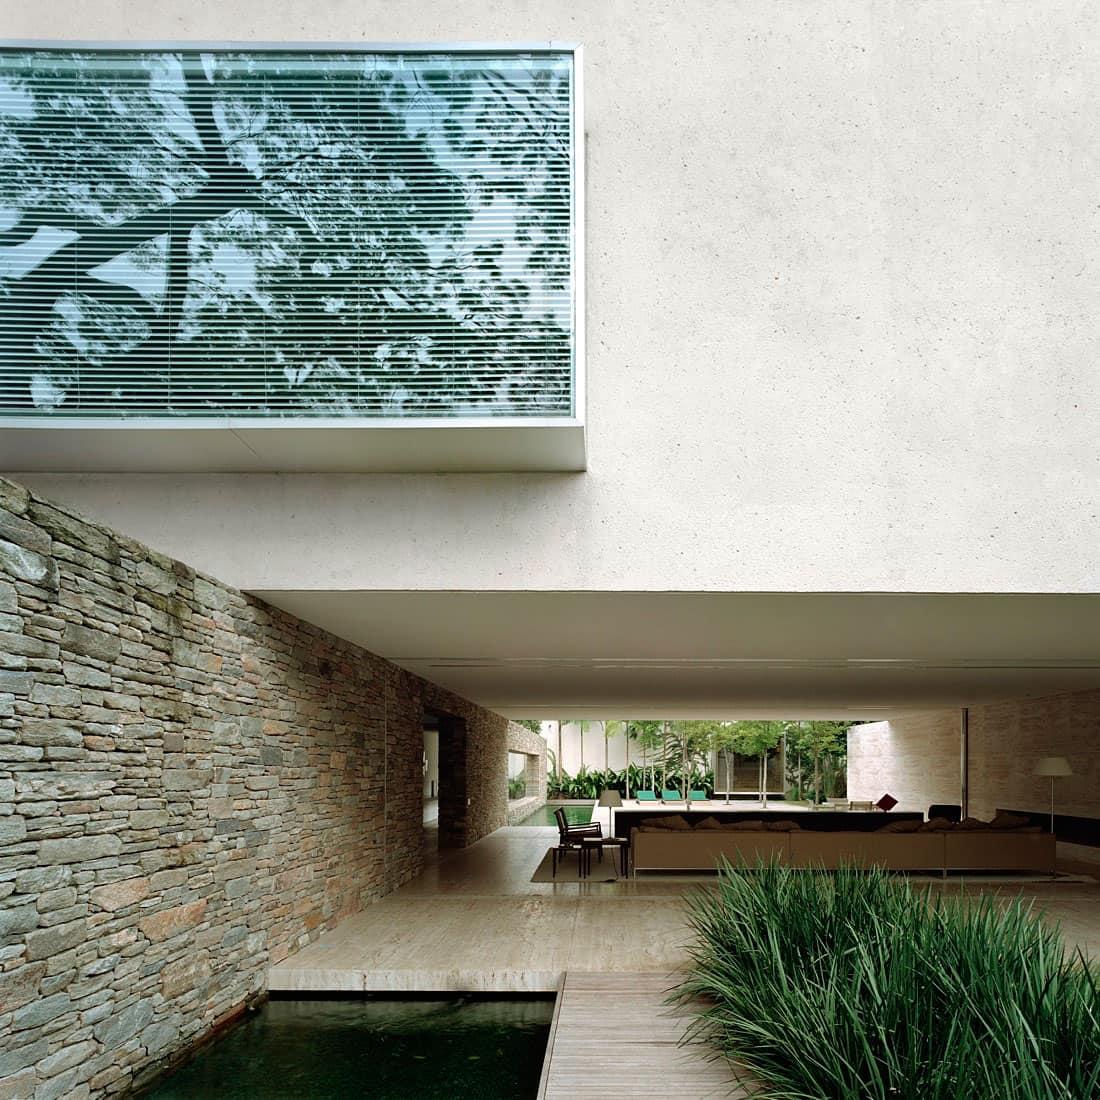 Mirindibas House by Studio MK27 – Marcio Kogan (4)